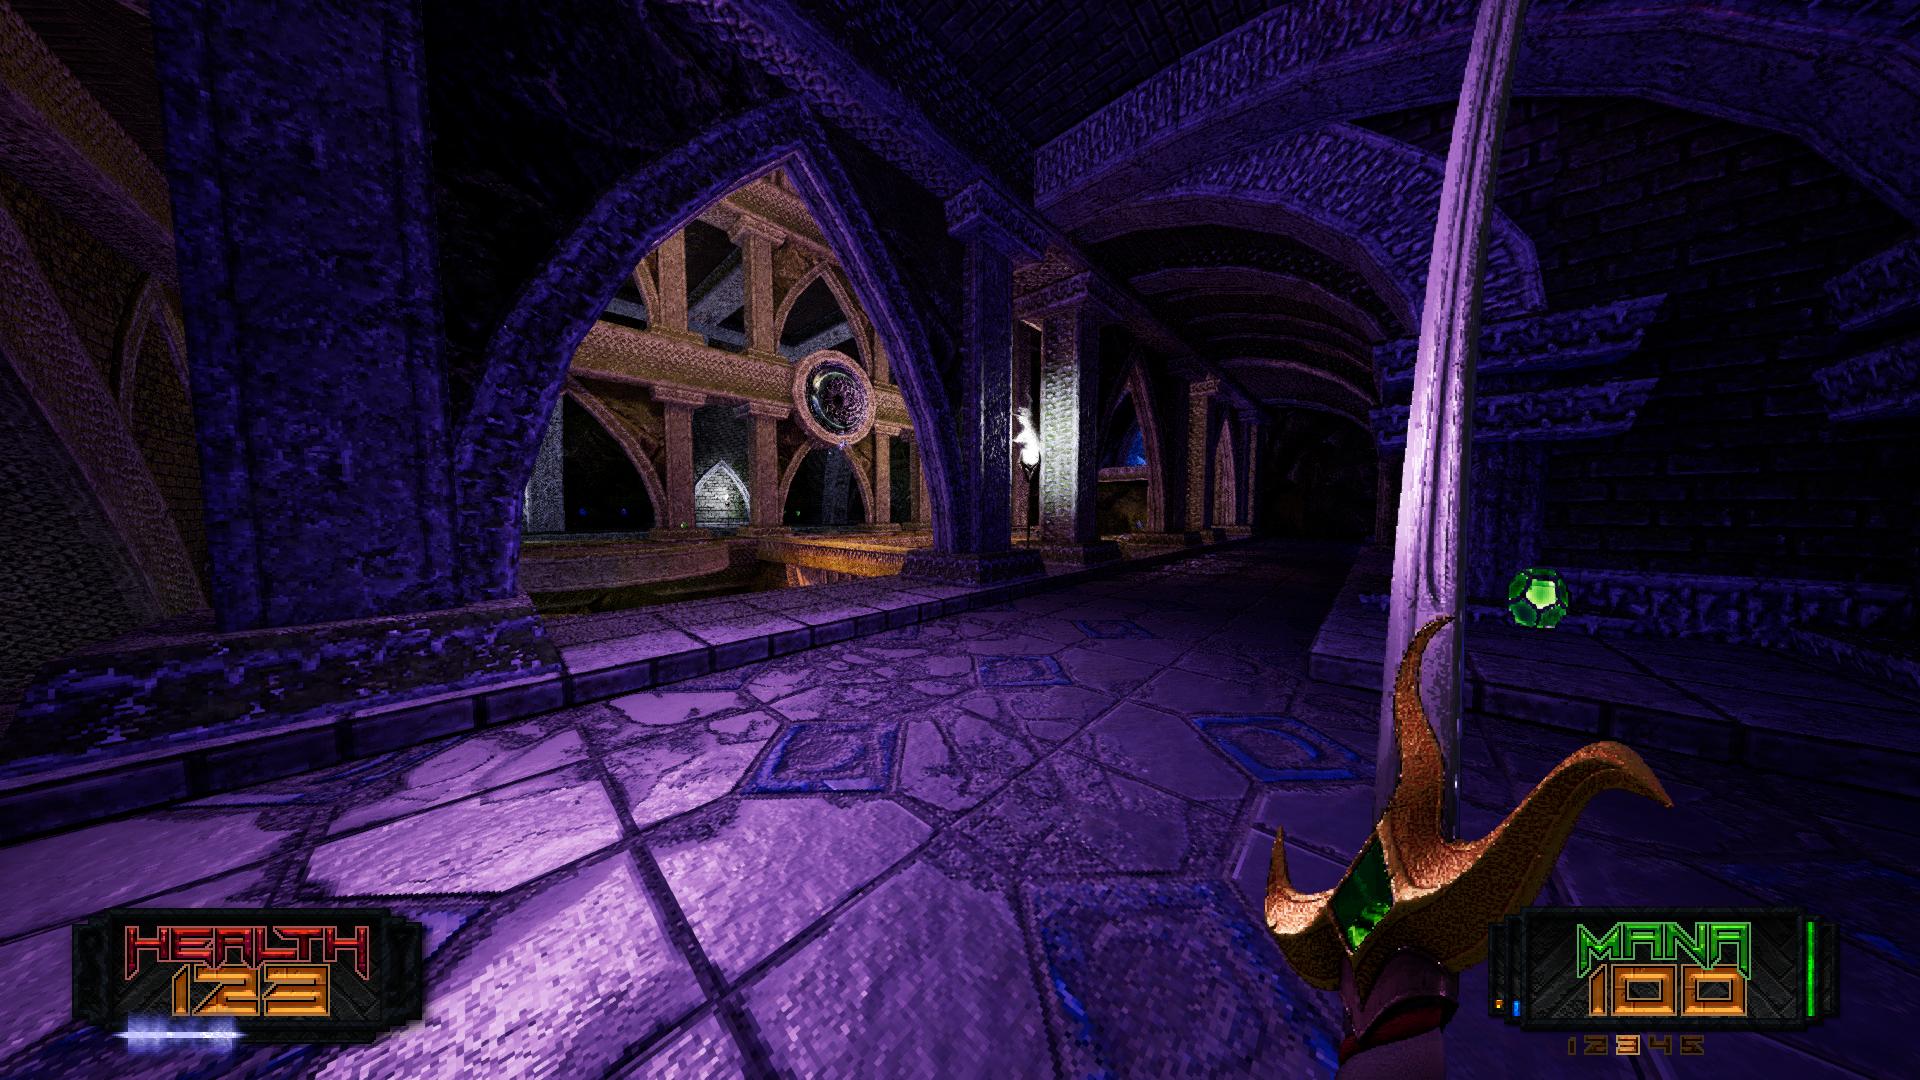 AMID EVIL screenshot original without CRT emulation